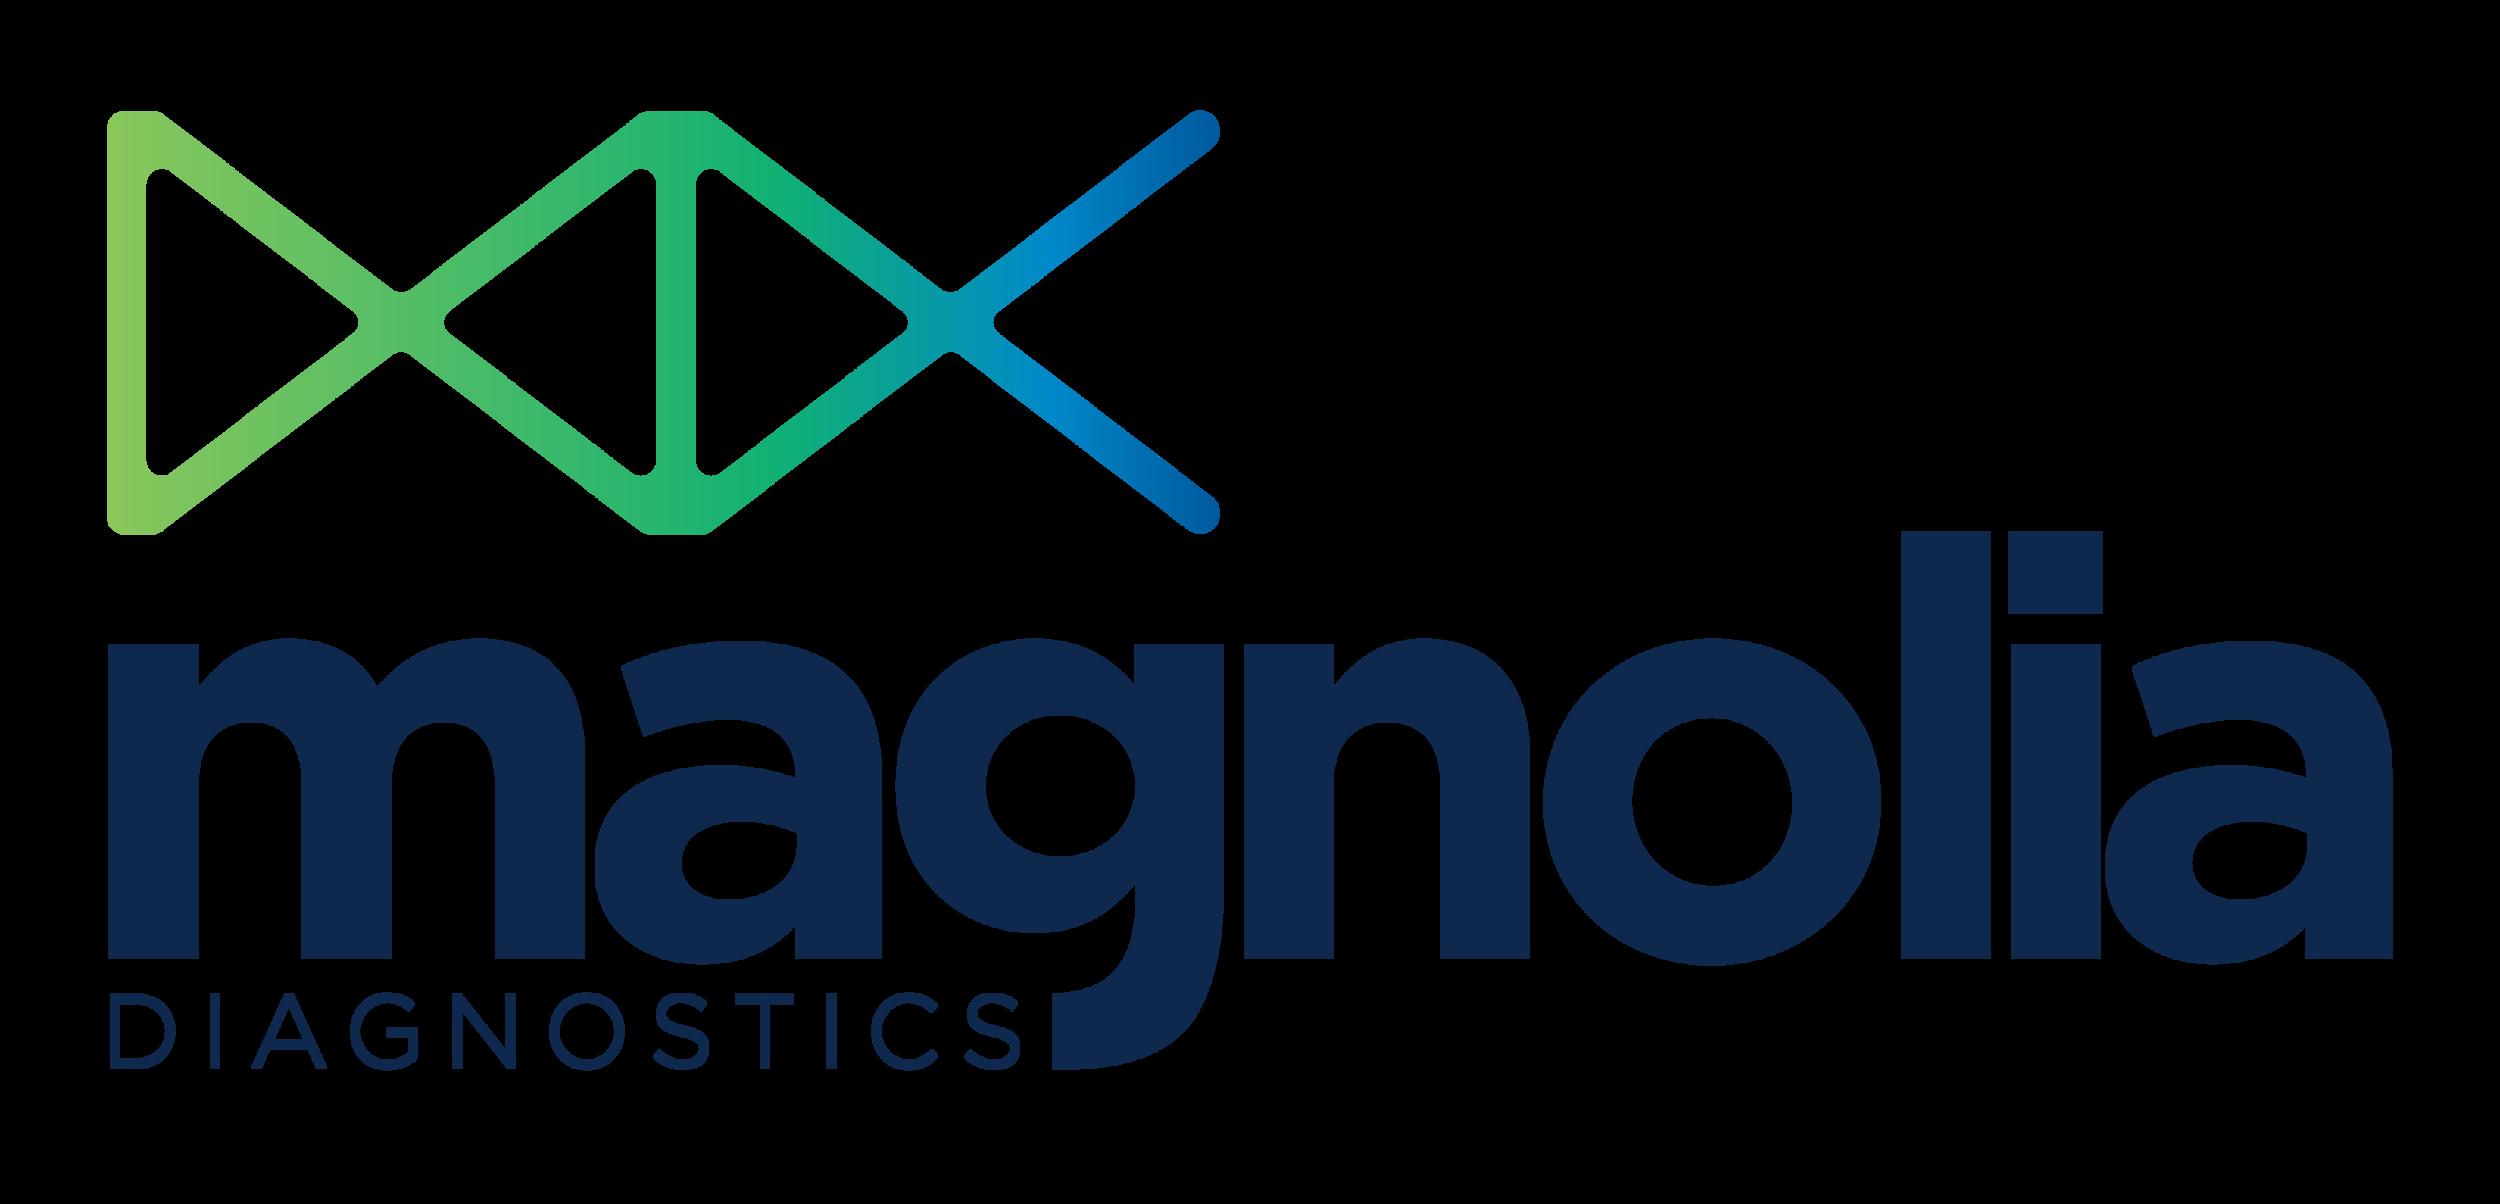 181019-Magnolia Logo Files-01.png